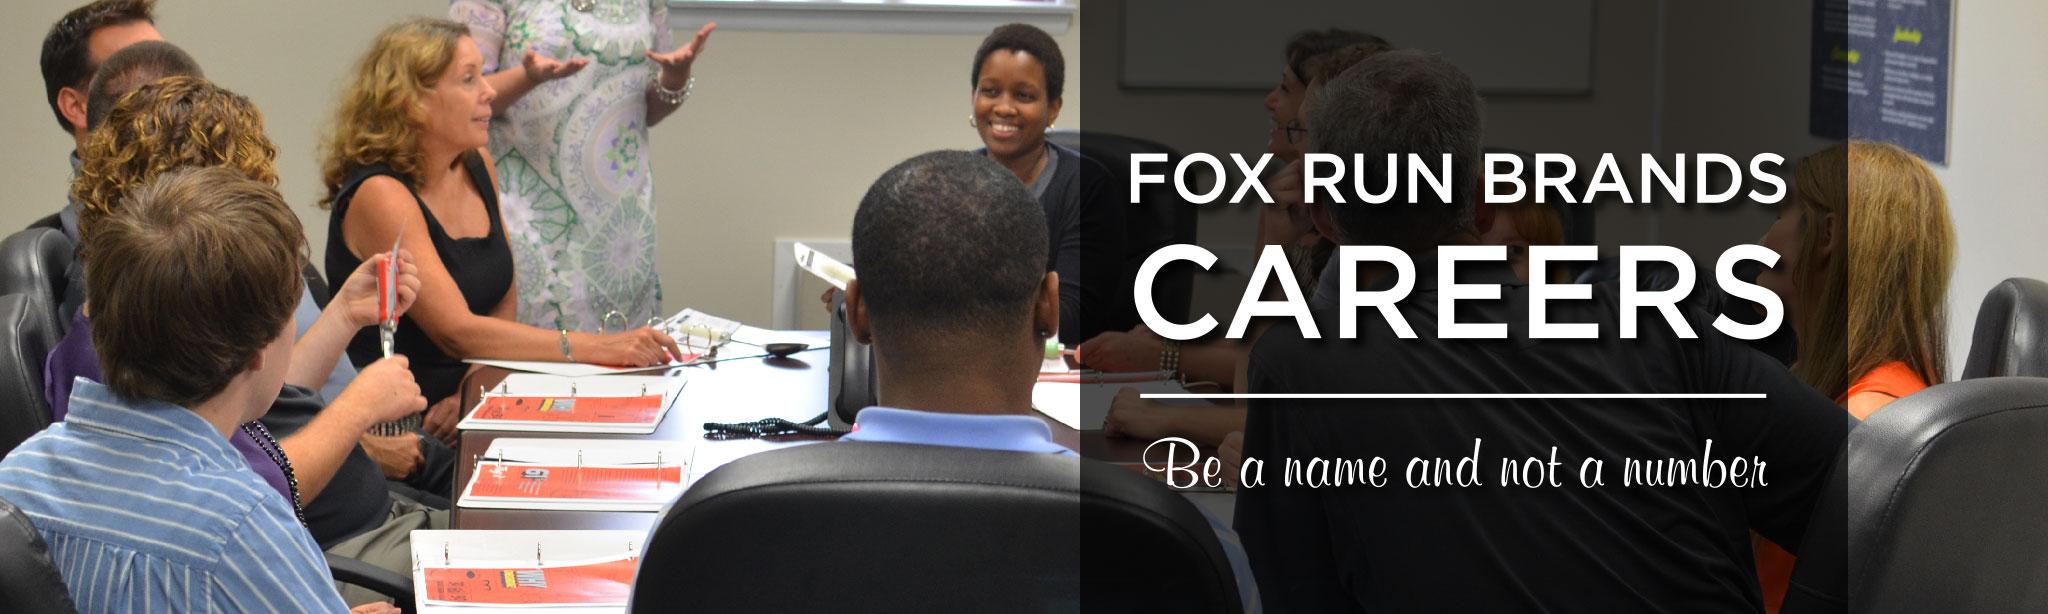 Careers Fox Run Brands Fox Run Brands